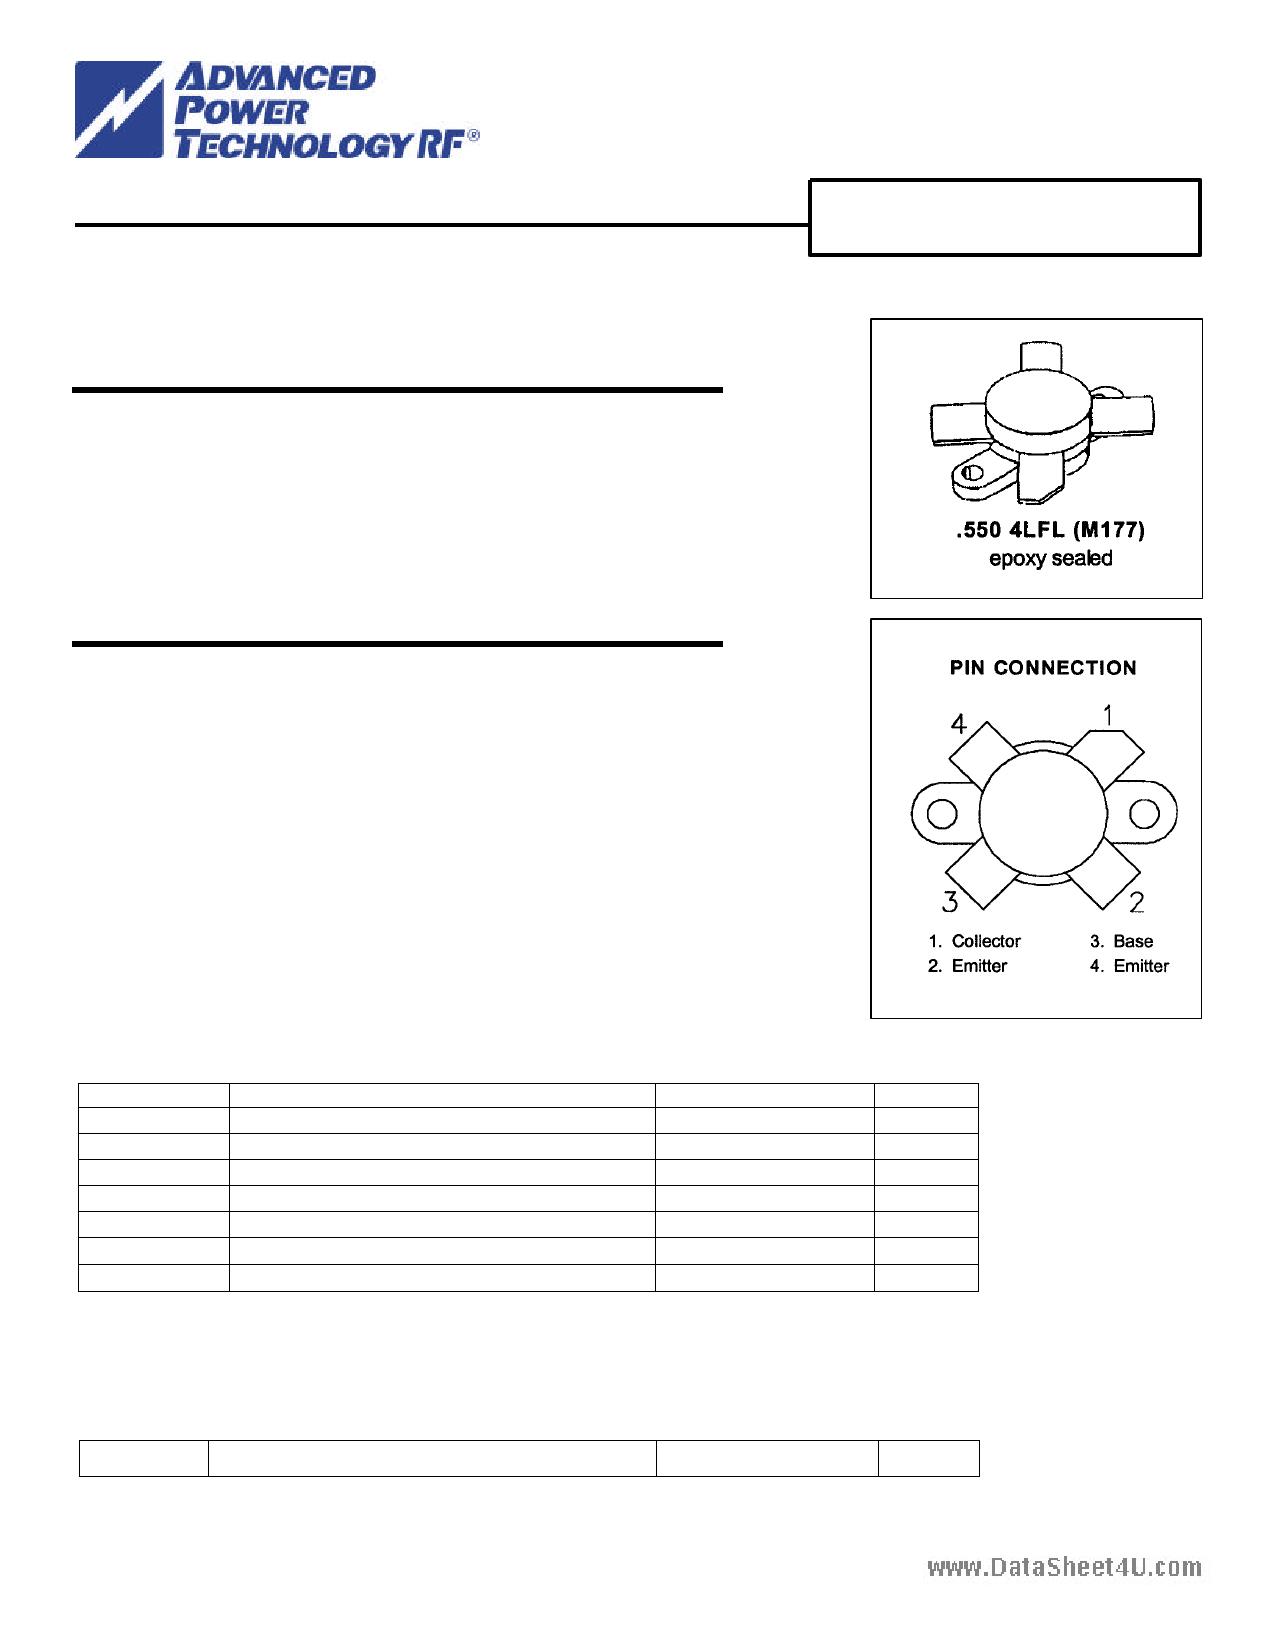 MS1011 데이터시트 및 MS1011 PDF